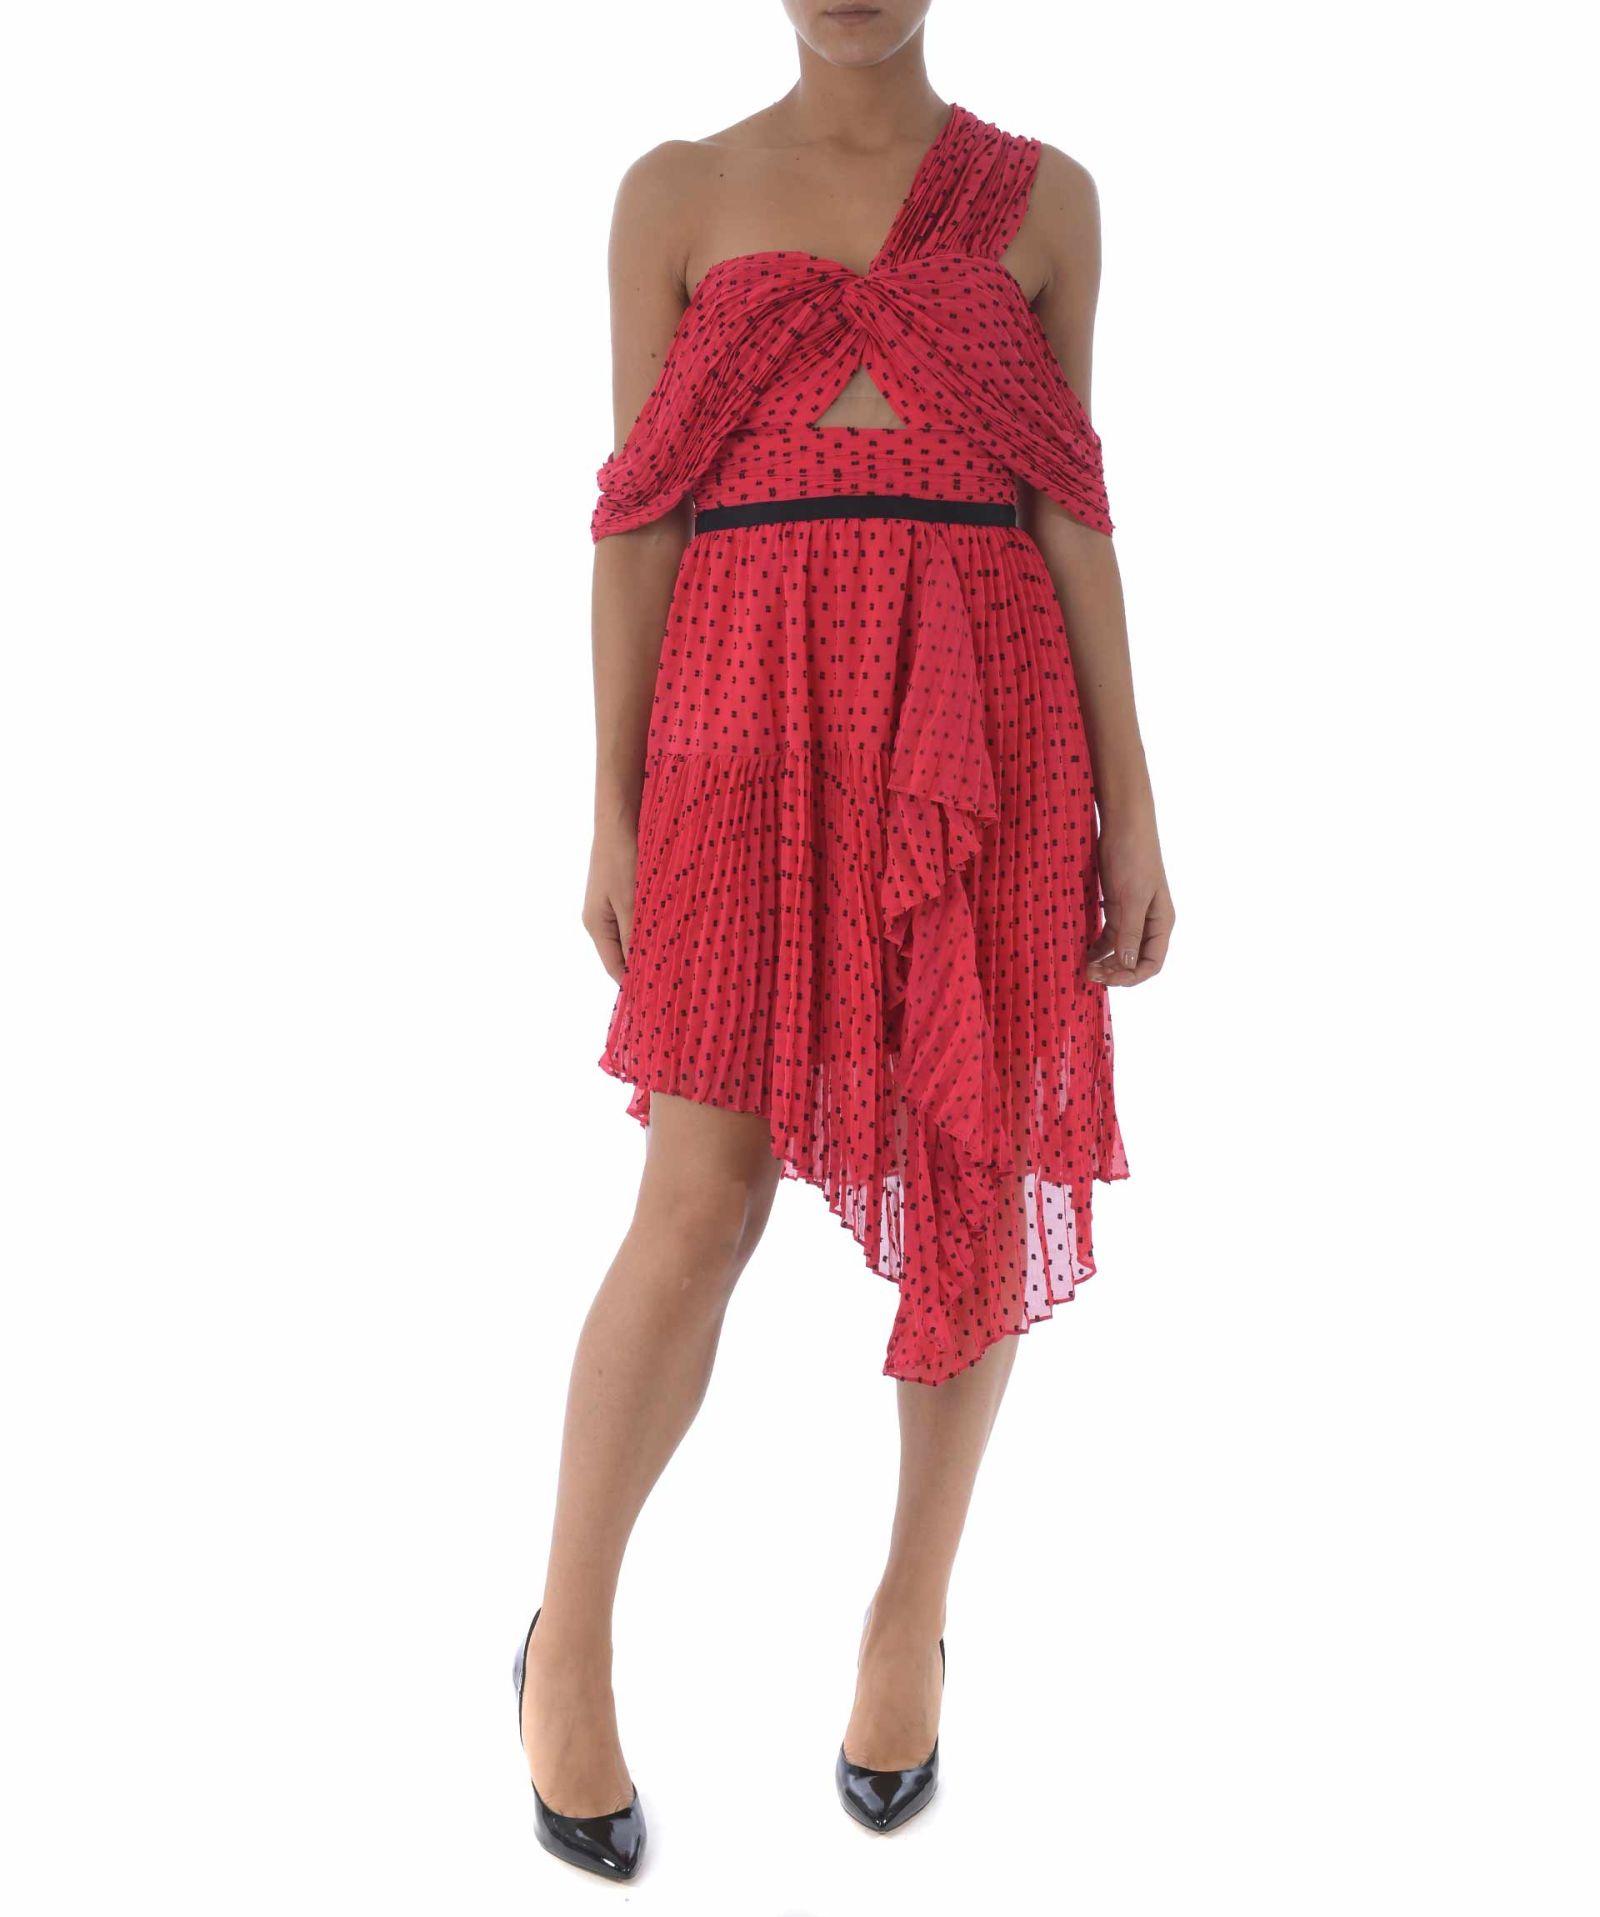 de578f8ac76e self-portrait Polka Dot Dress - Rosso - 10760528 | italist